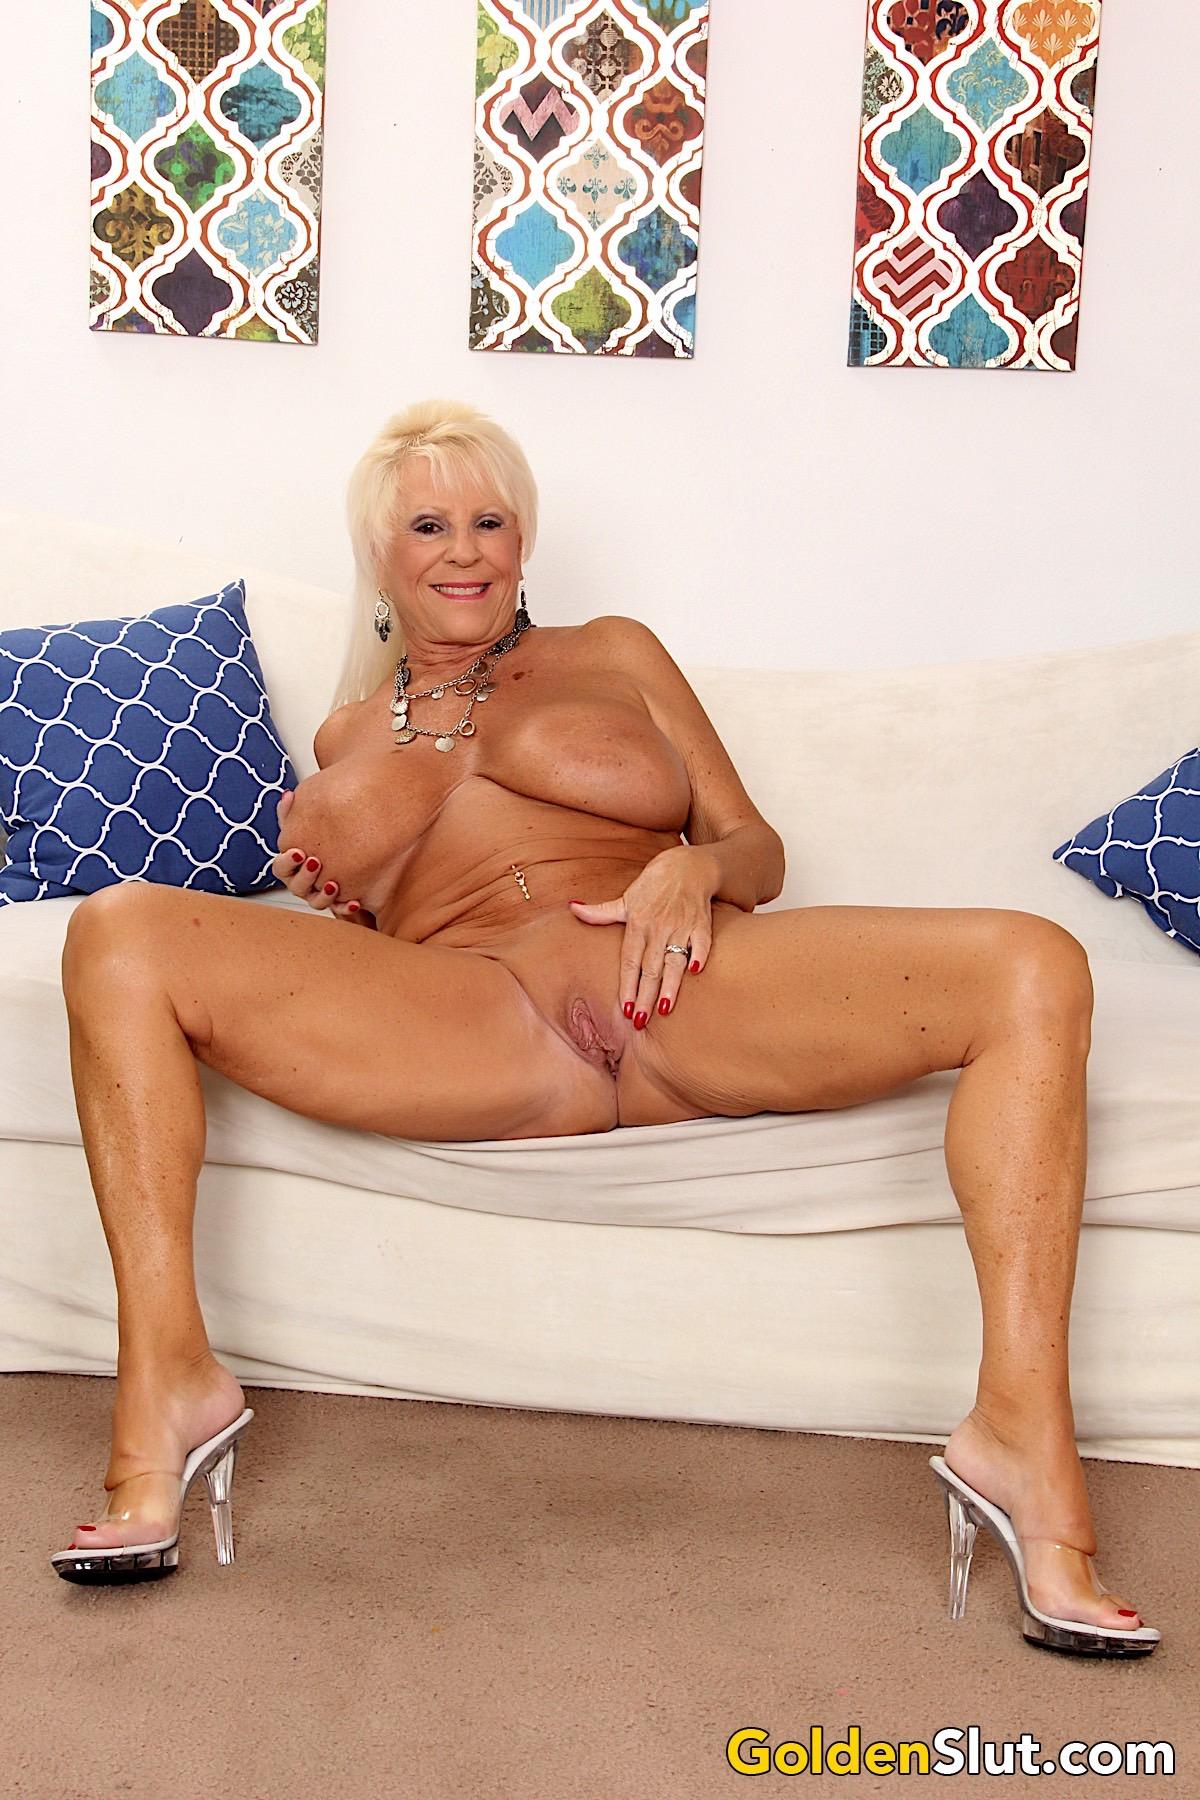 Mandi mcgraw nude pics